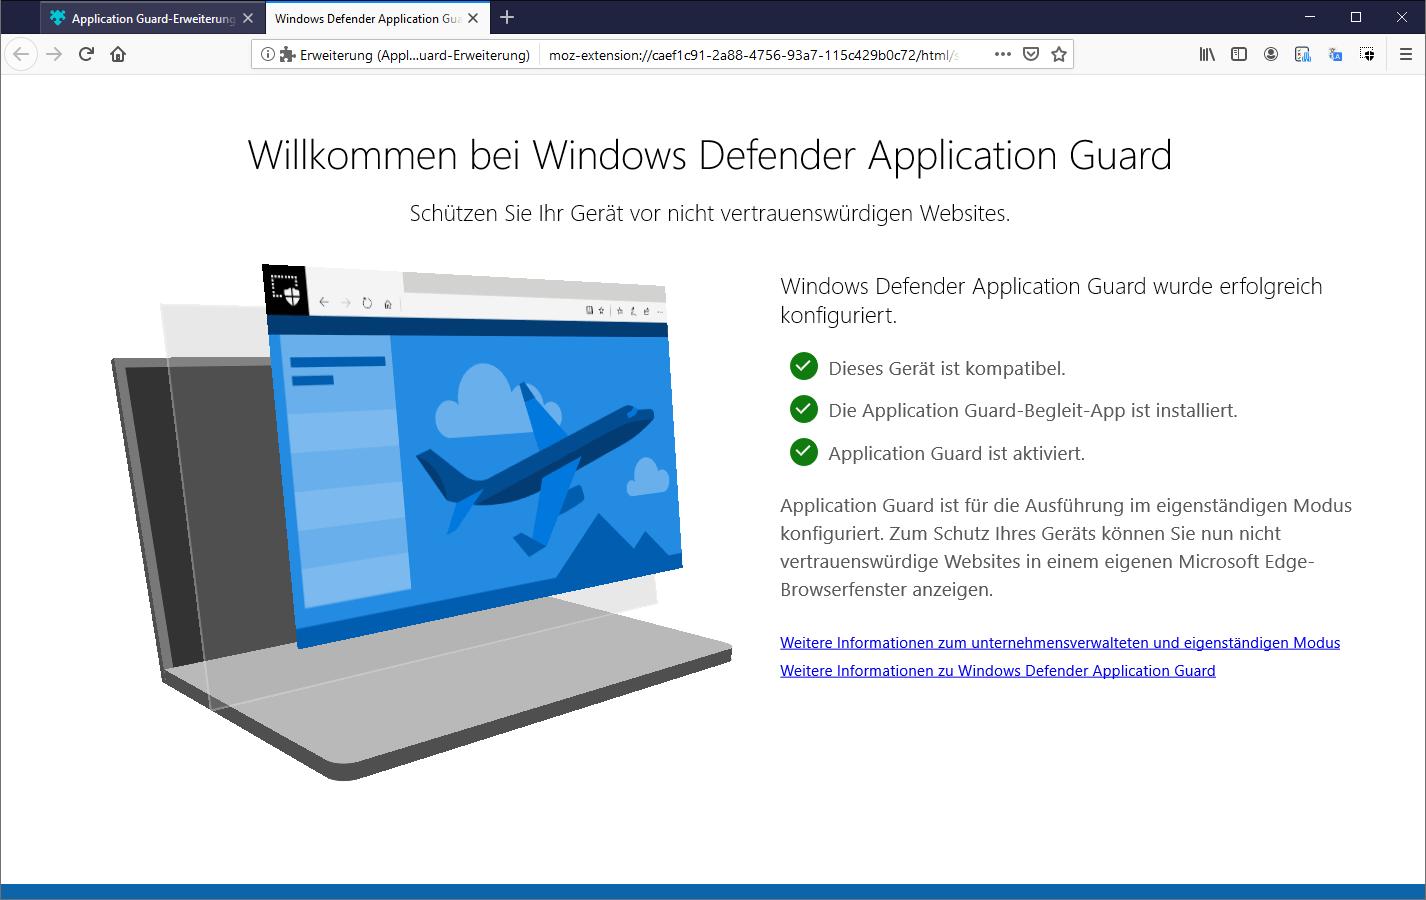 Windows Defender Application Guard Edge Chrome